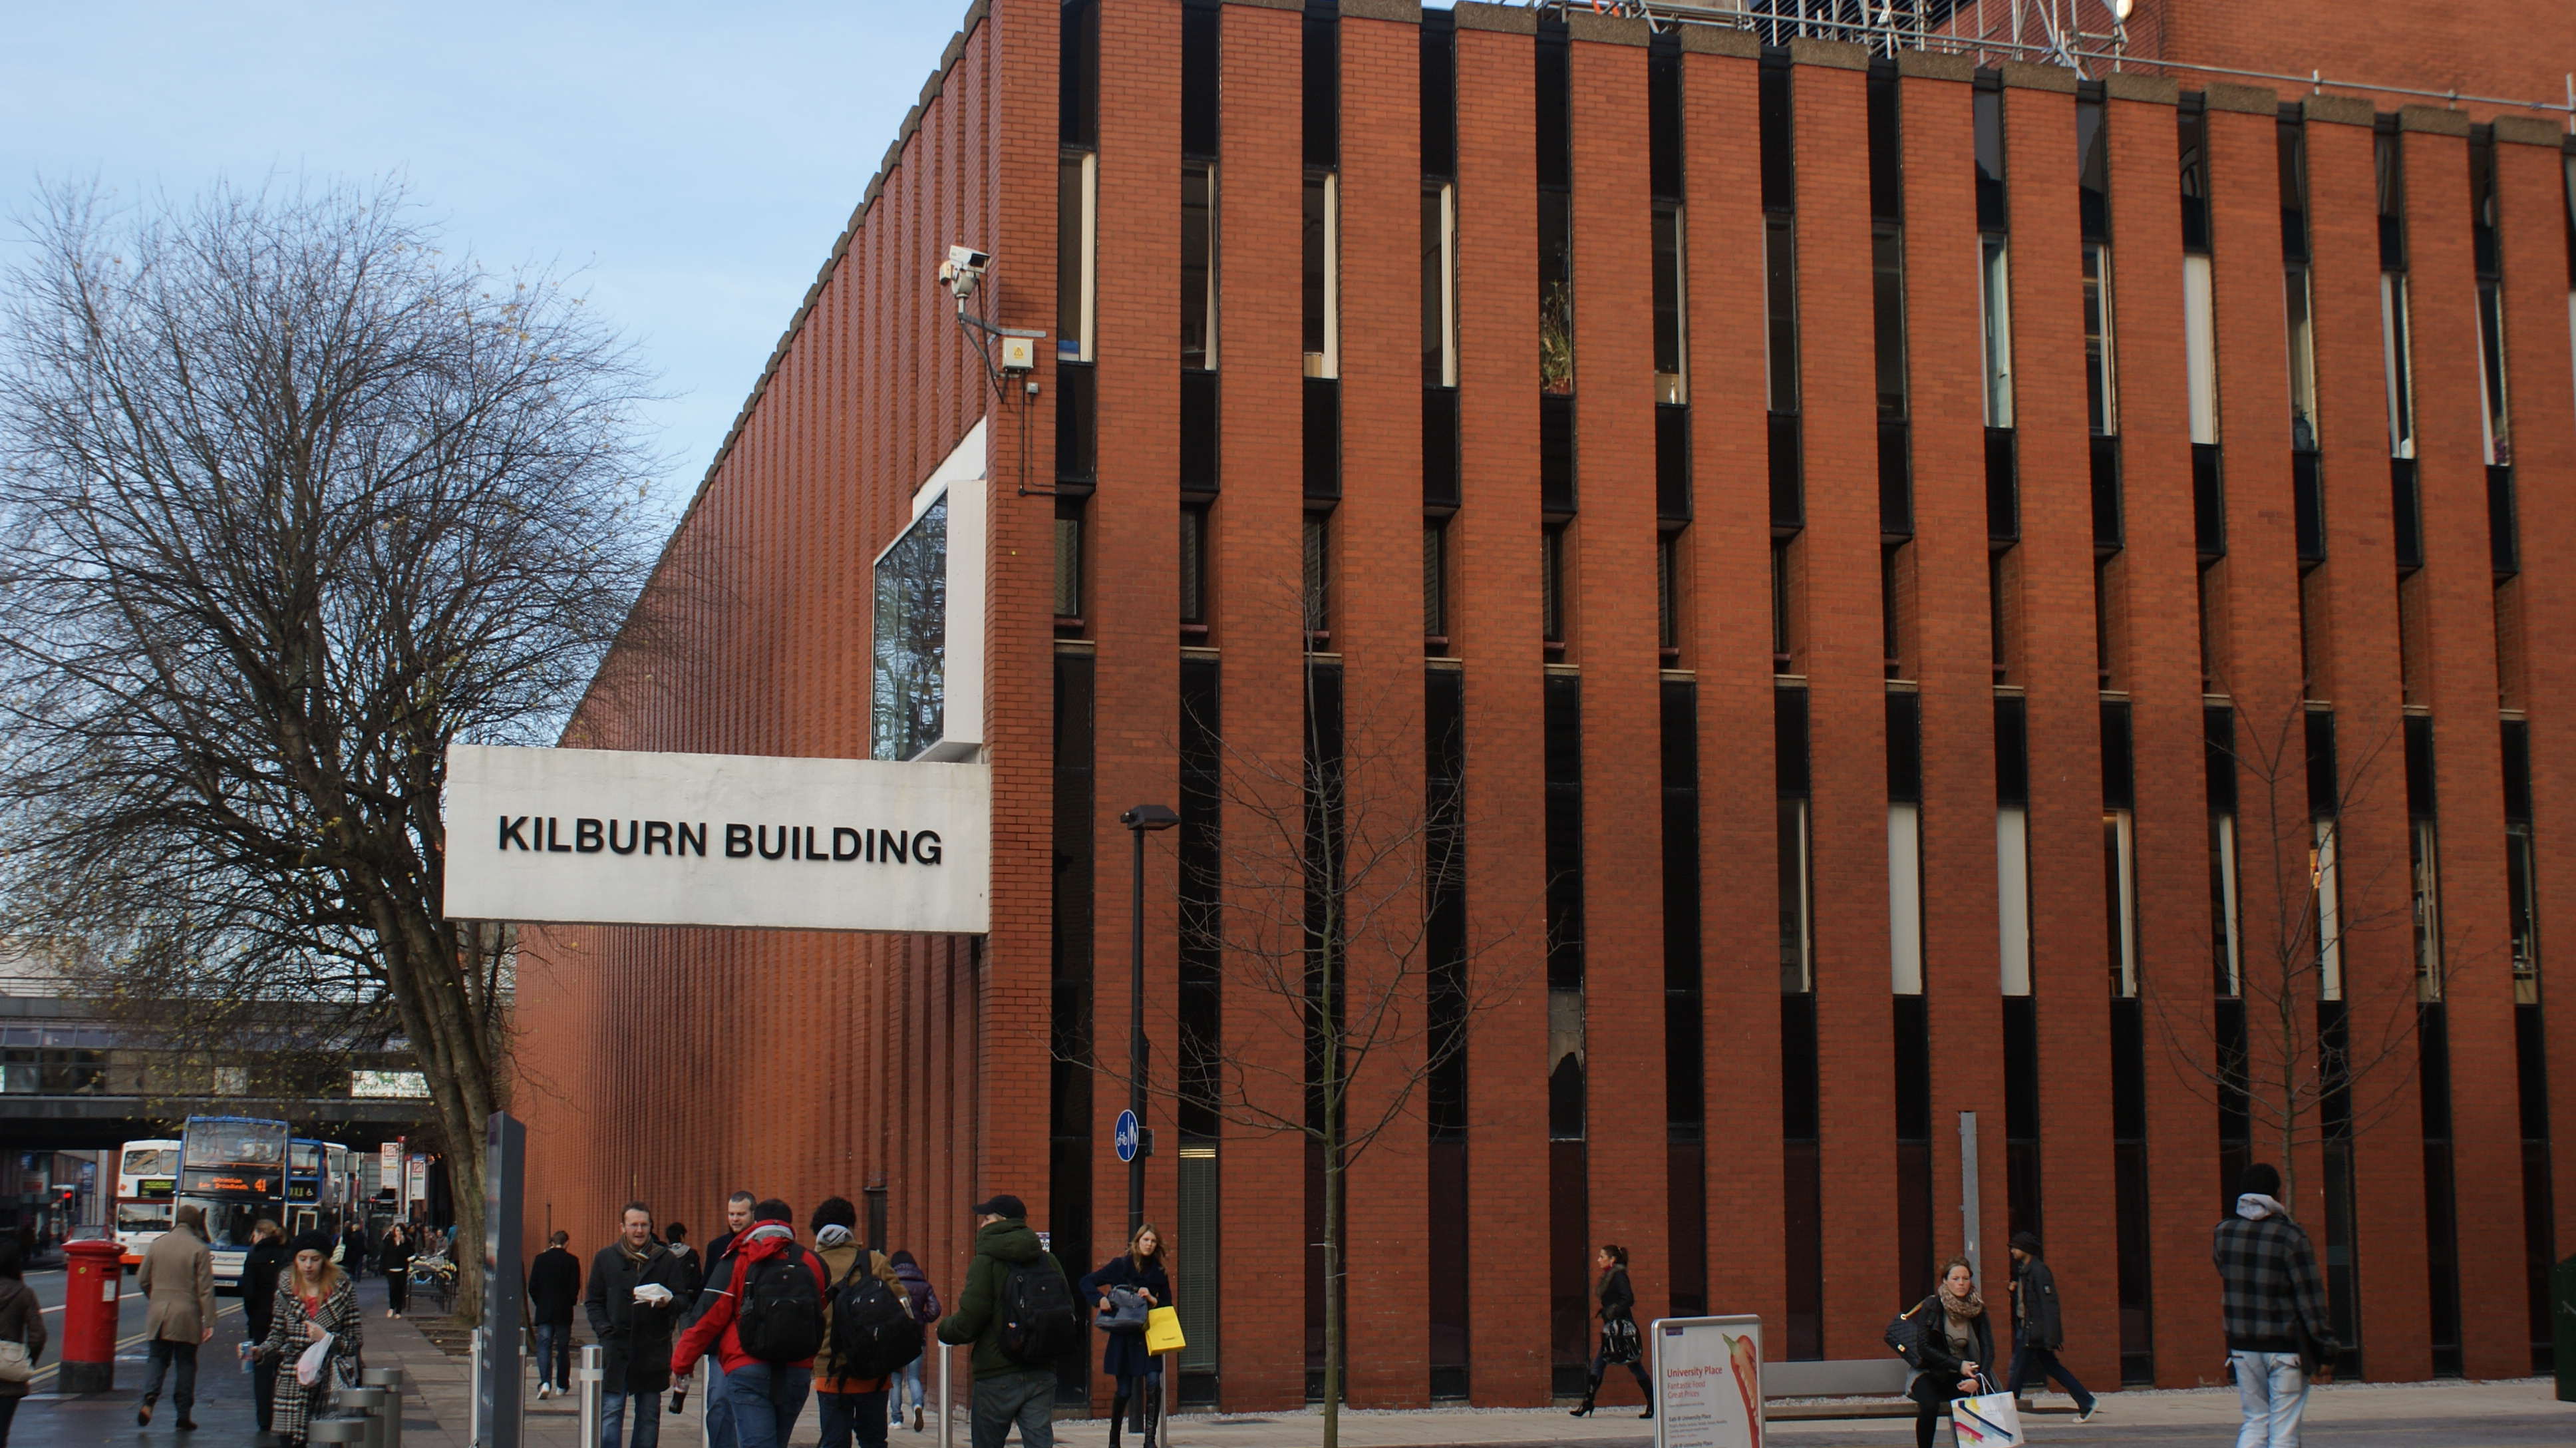 8%2f8a%2fmanchester kilburn building